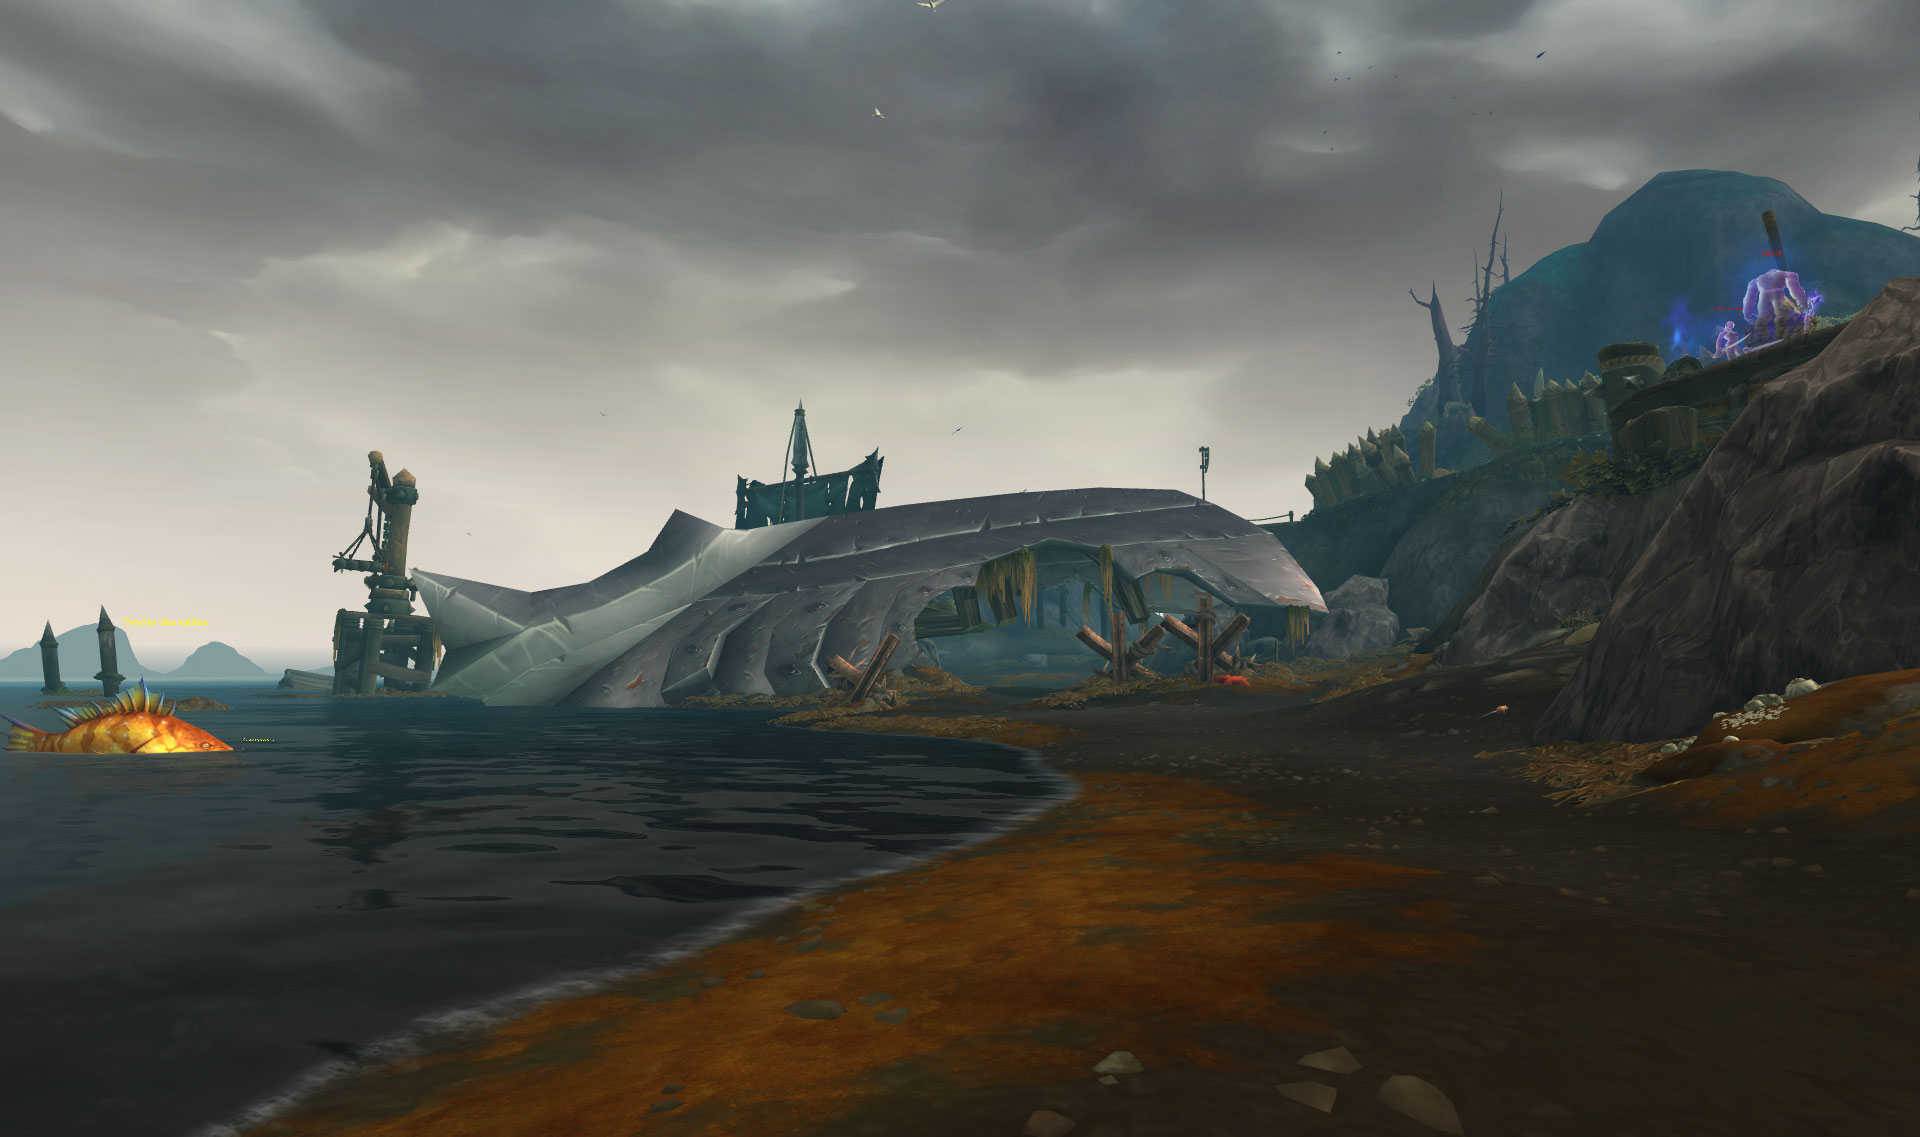 Screenshot de l'île de l'affliction (Crestfall) du patch 8.2 de World of Warcraft.